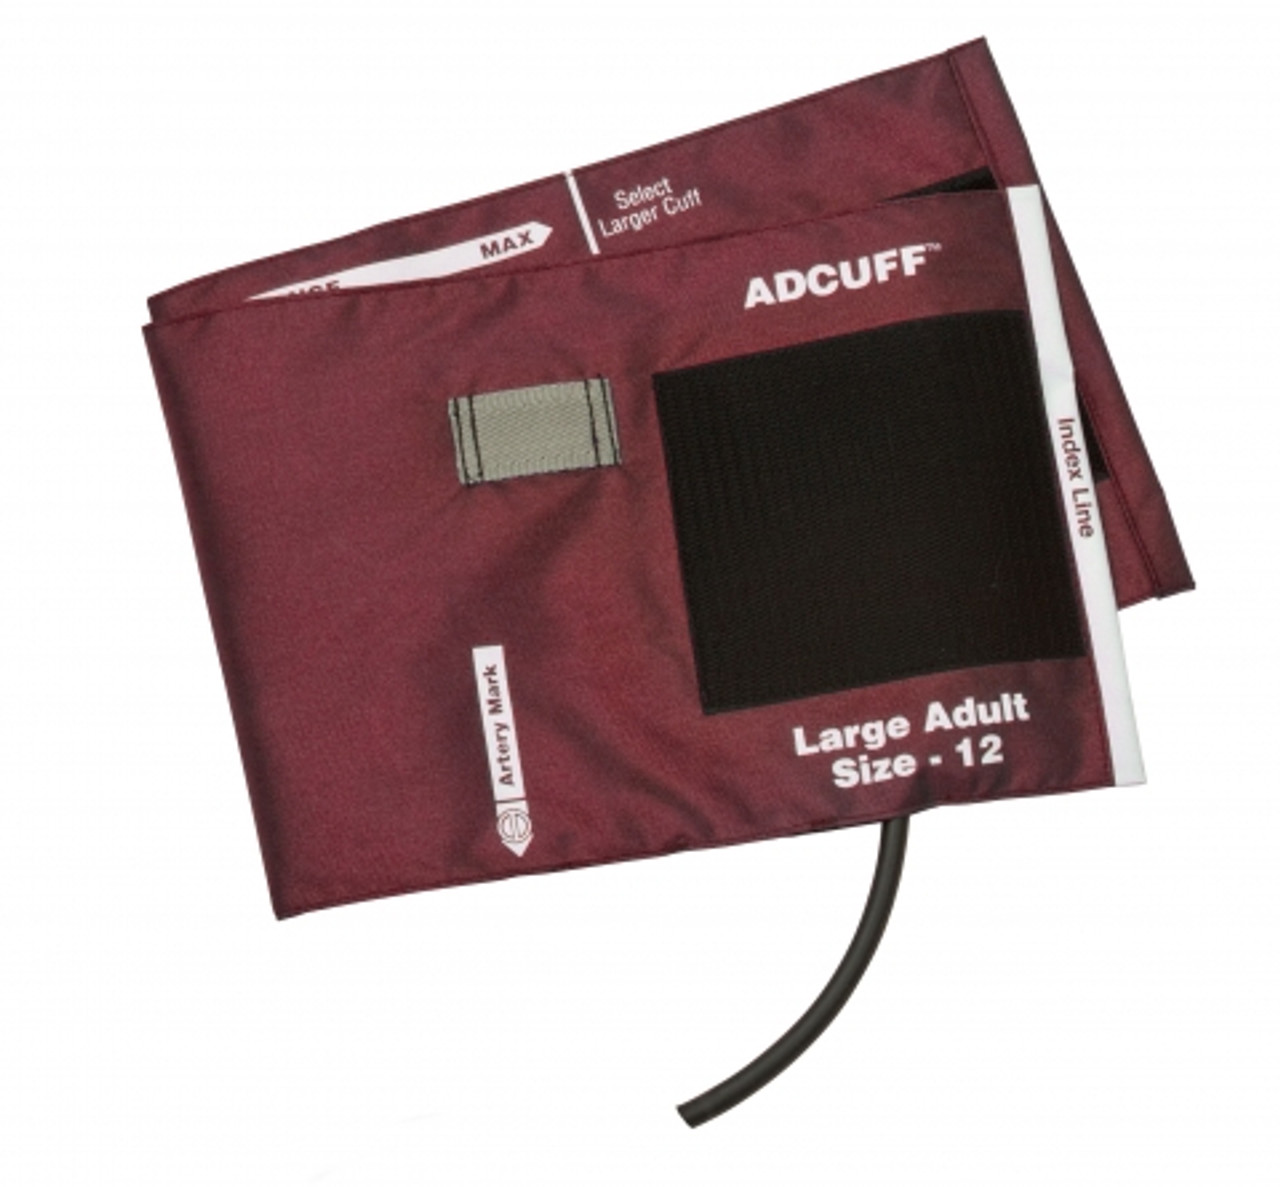 Large Adult Cuff